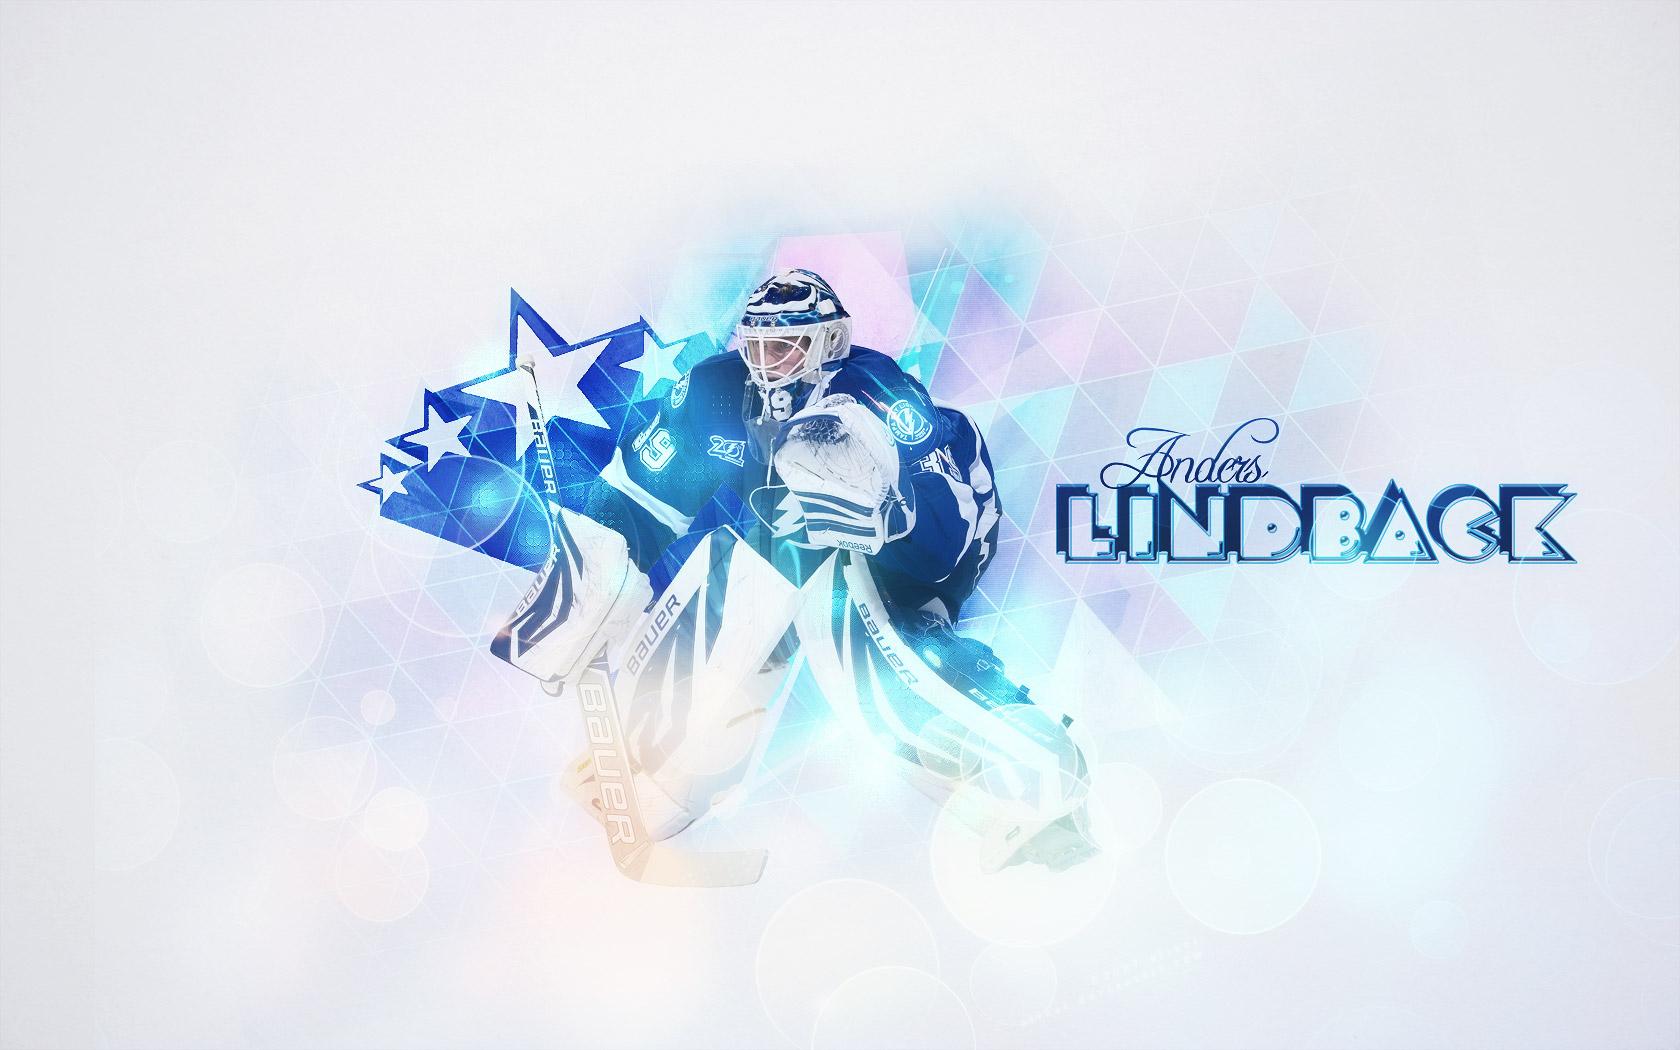 NHL Wallpapers   Anders Lindback Tampa Bay Lightning 2014 wallpaper 1680x1050